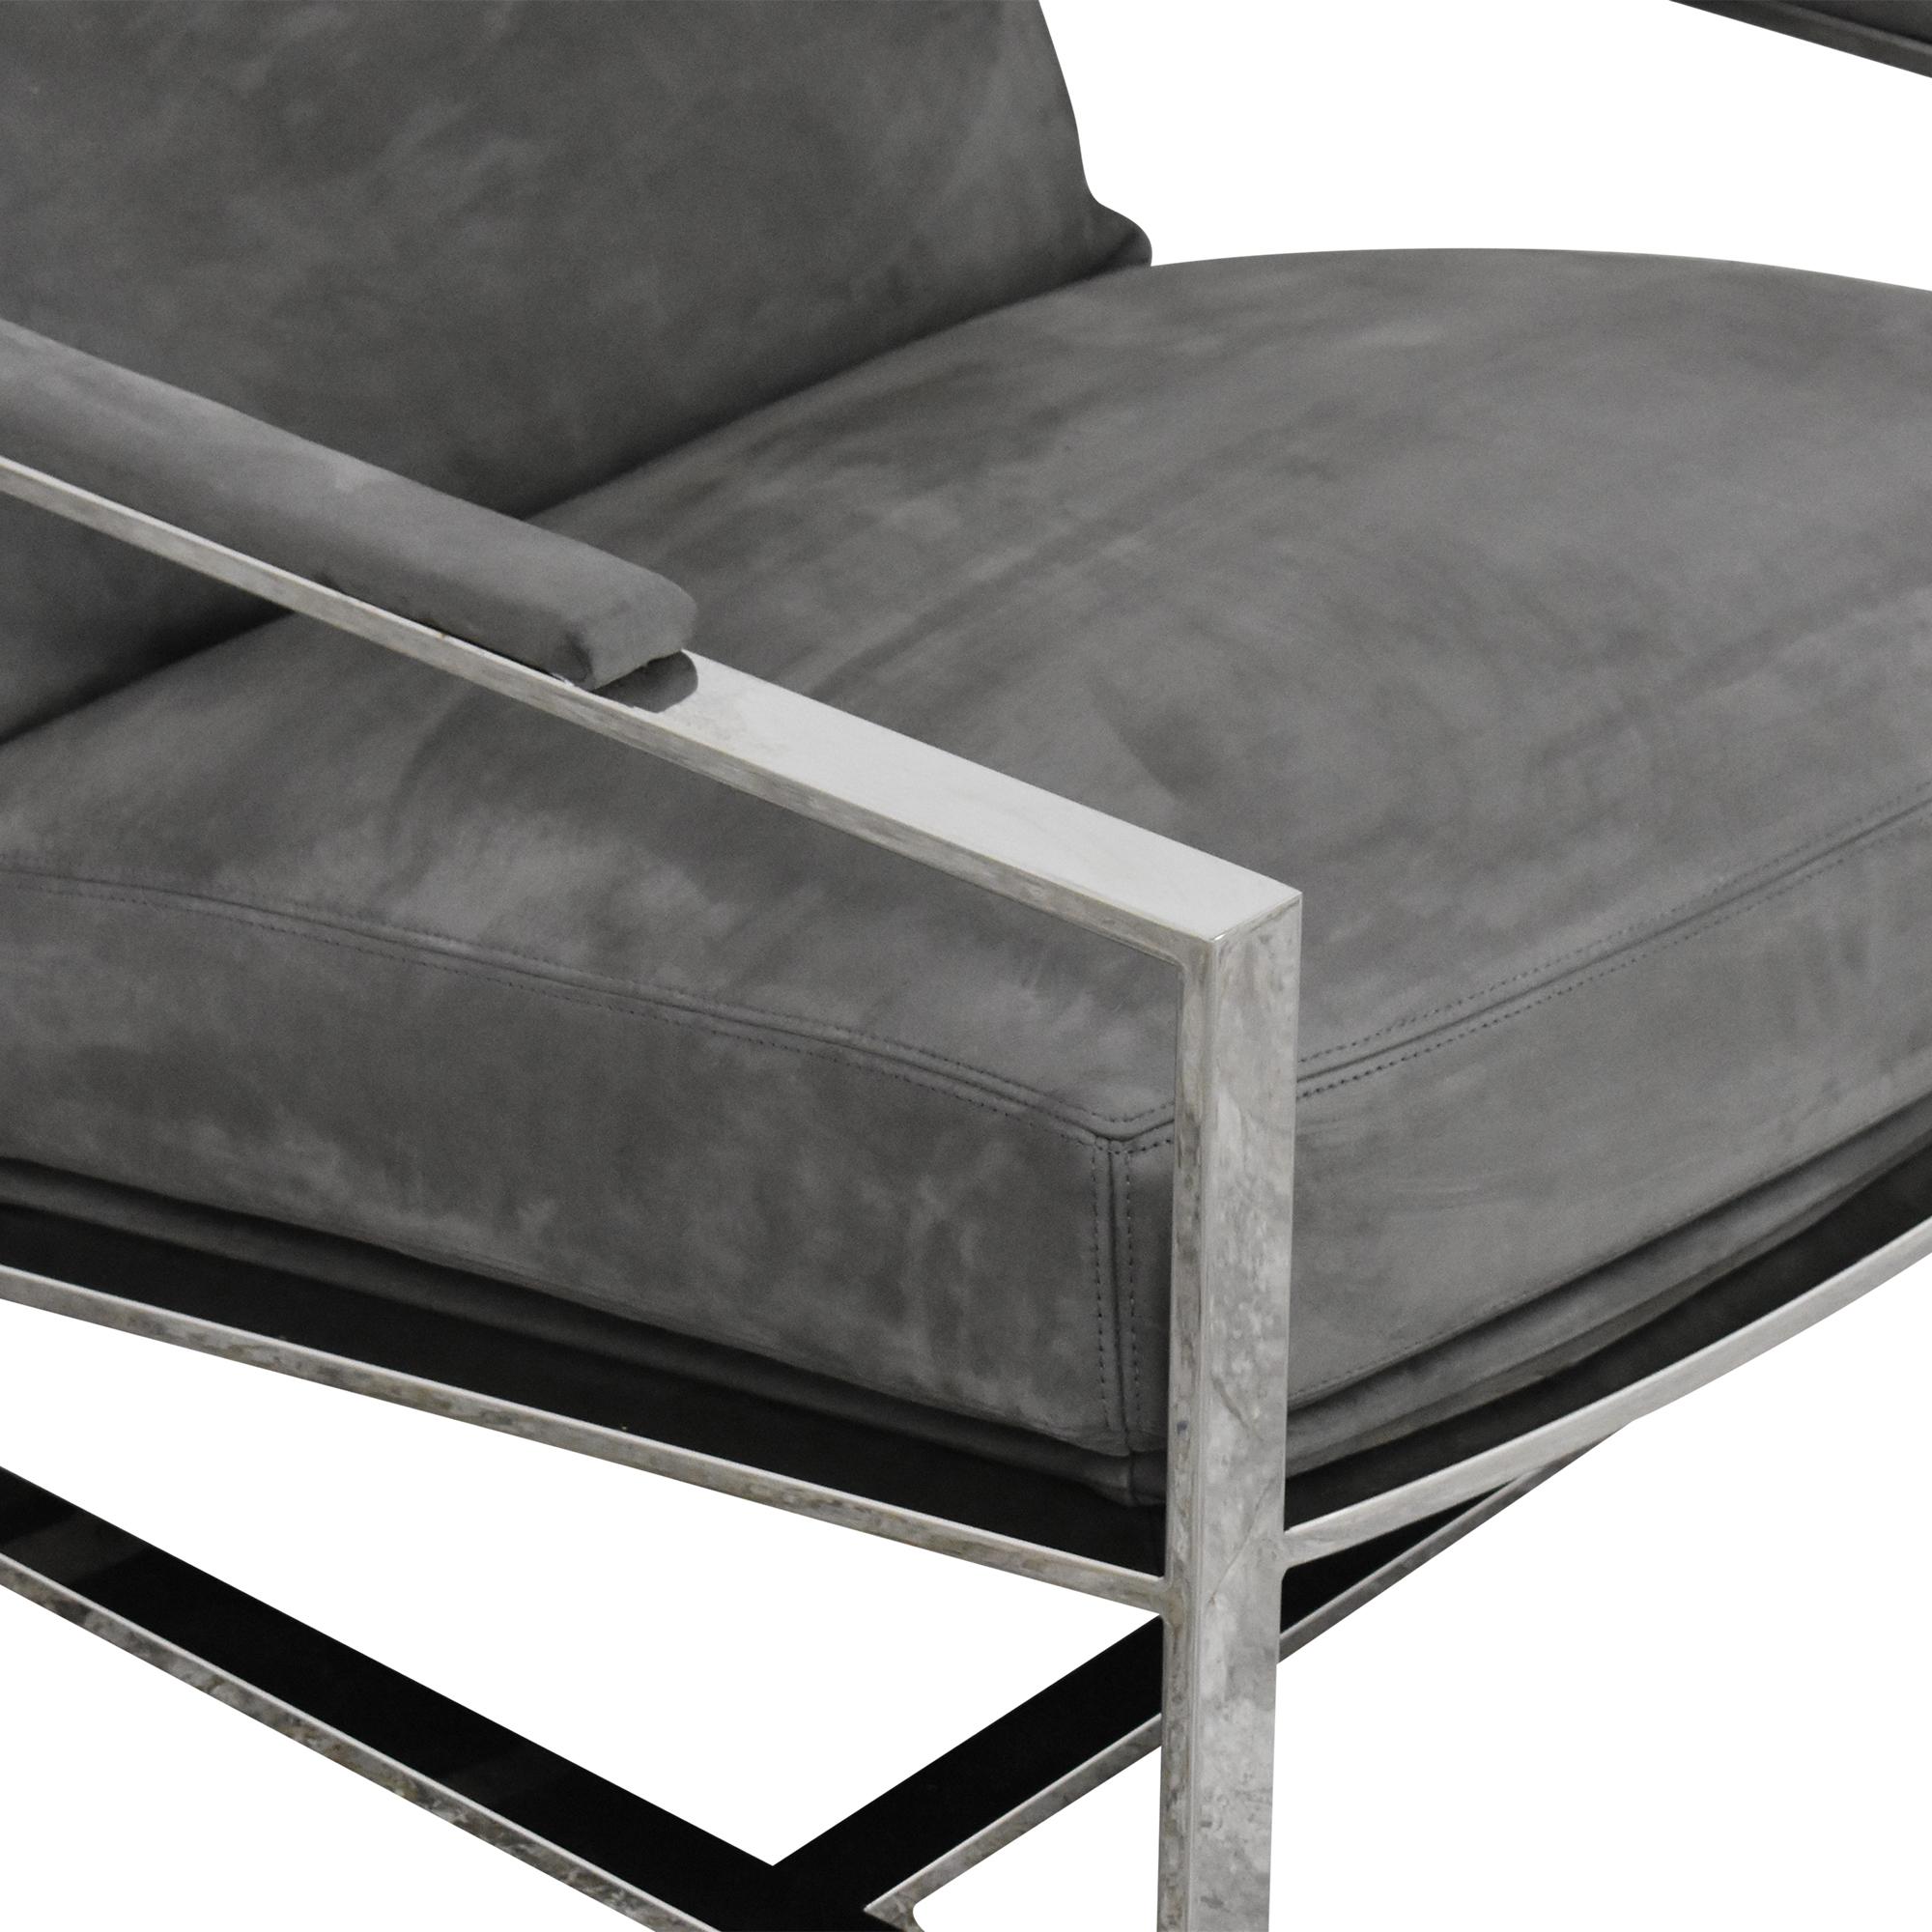 Restoration Hardware Milo Baughman Model #3418 Chair by Thayer Coggin Restoration Hardware